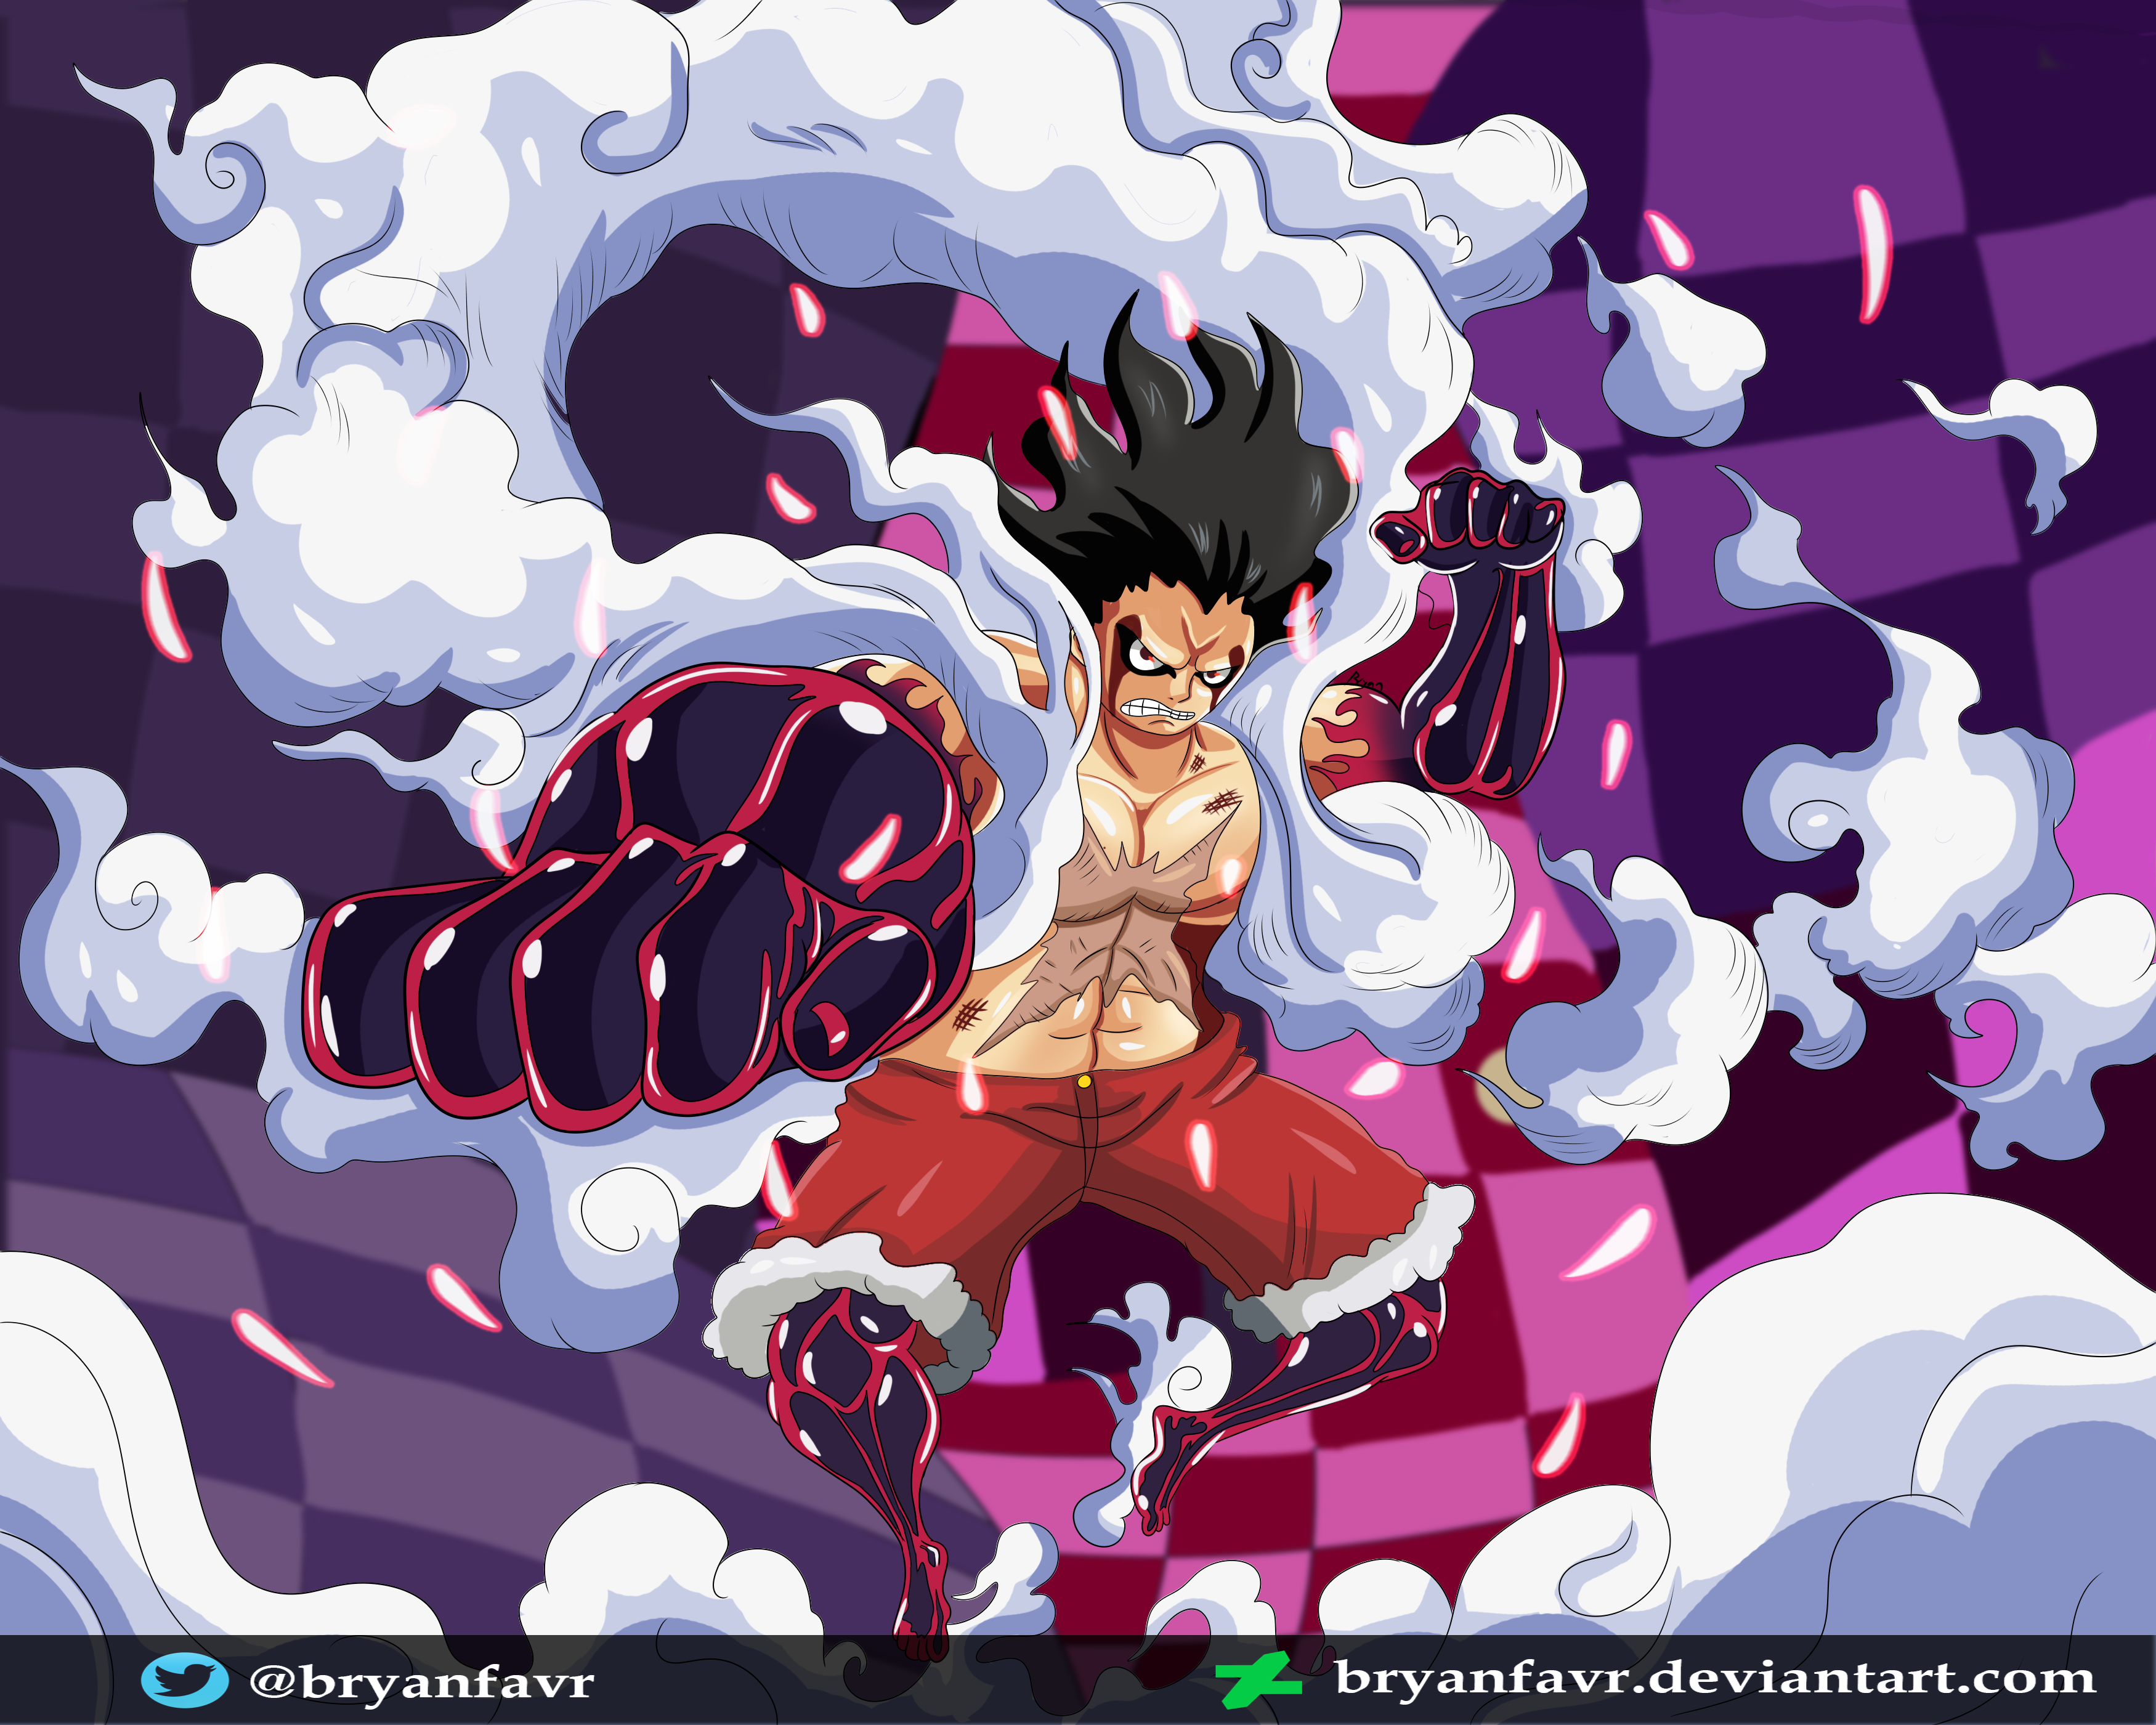 Gear 4 Snakeman One Piece Ch 895 By Bryanfavr On Deviantart